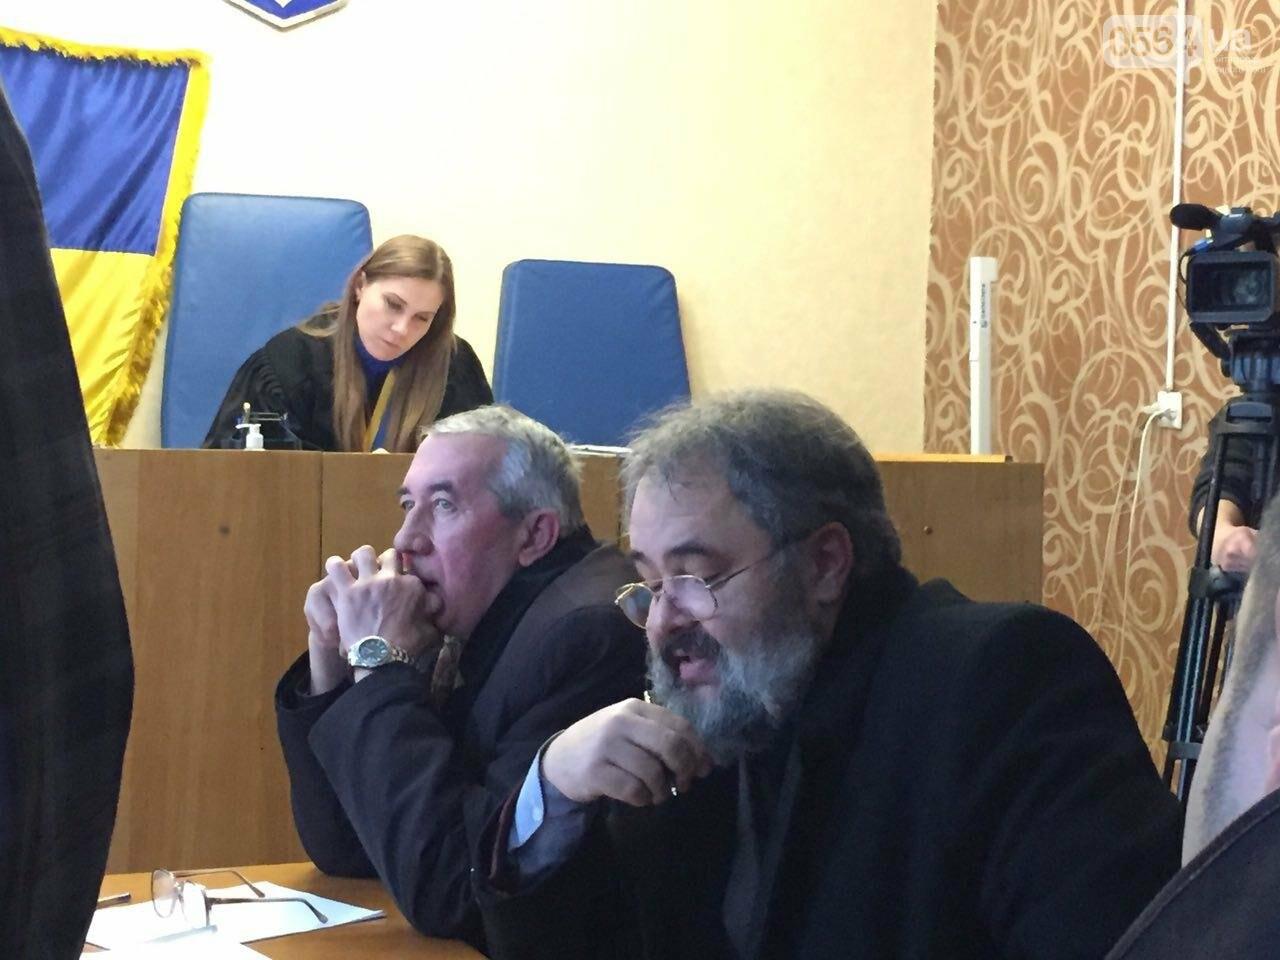 Криворожских журналистов в суде  допрашивают по делу Вячеслава Волка (ФОТО), фото-7